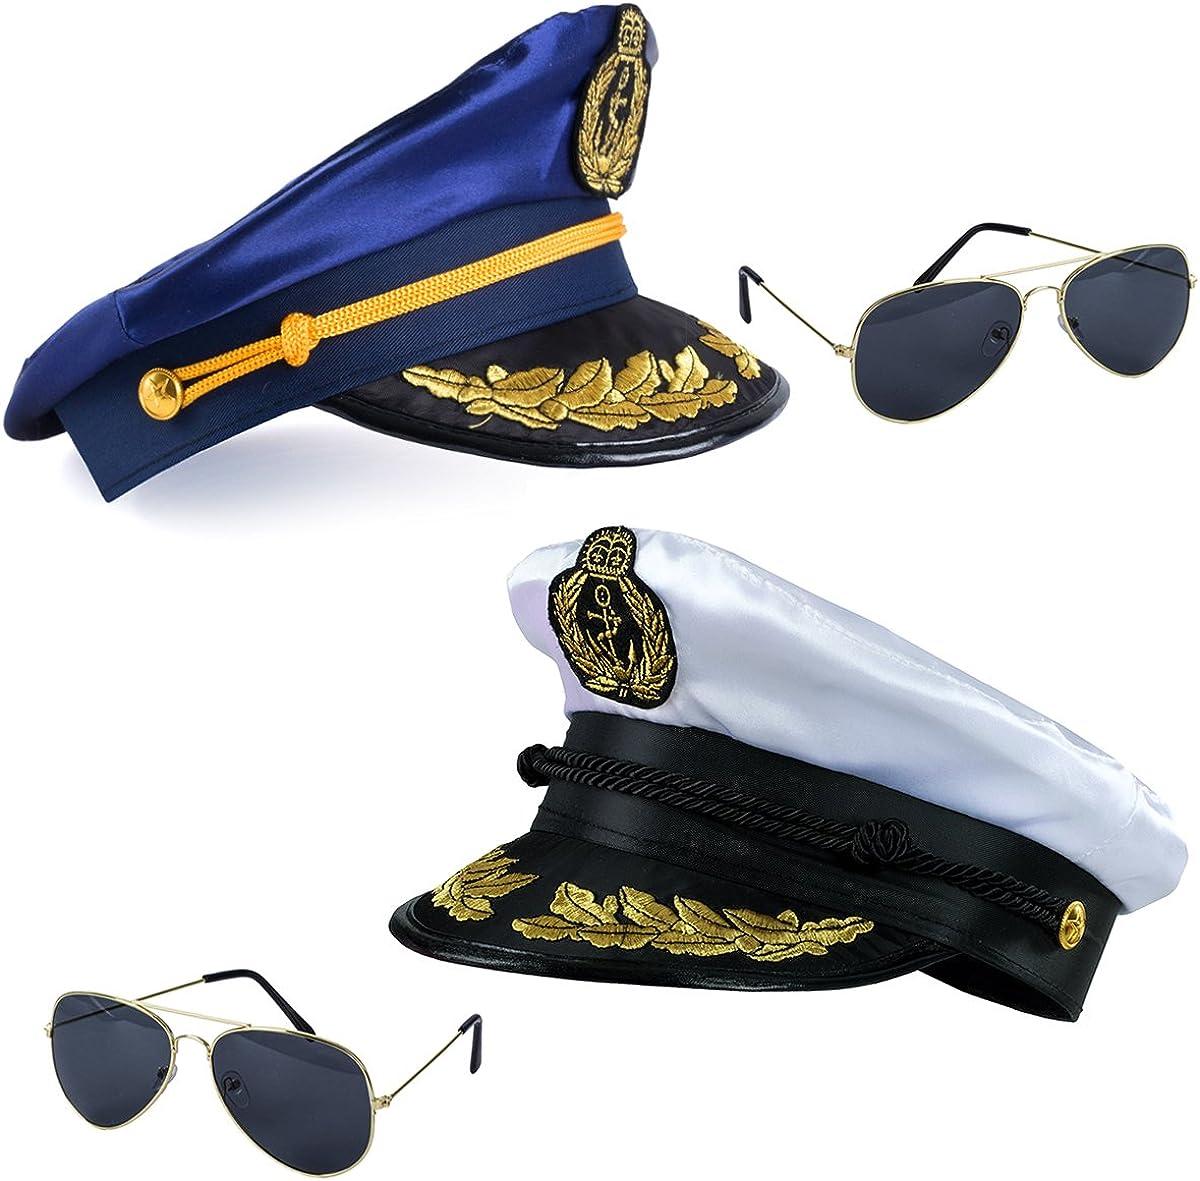 Tigerdoe Yacht Captain Hats - Marine Sailor Caps - Skipper Party - Nautical Costume Accessories